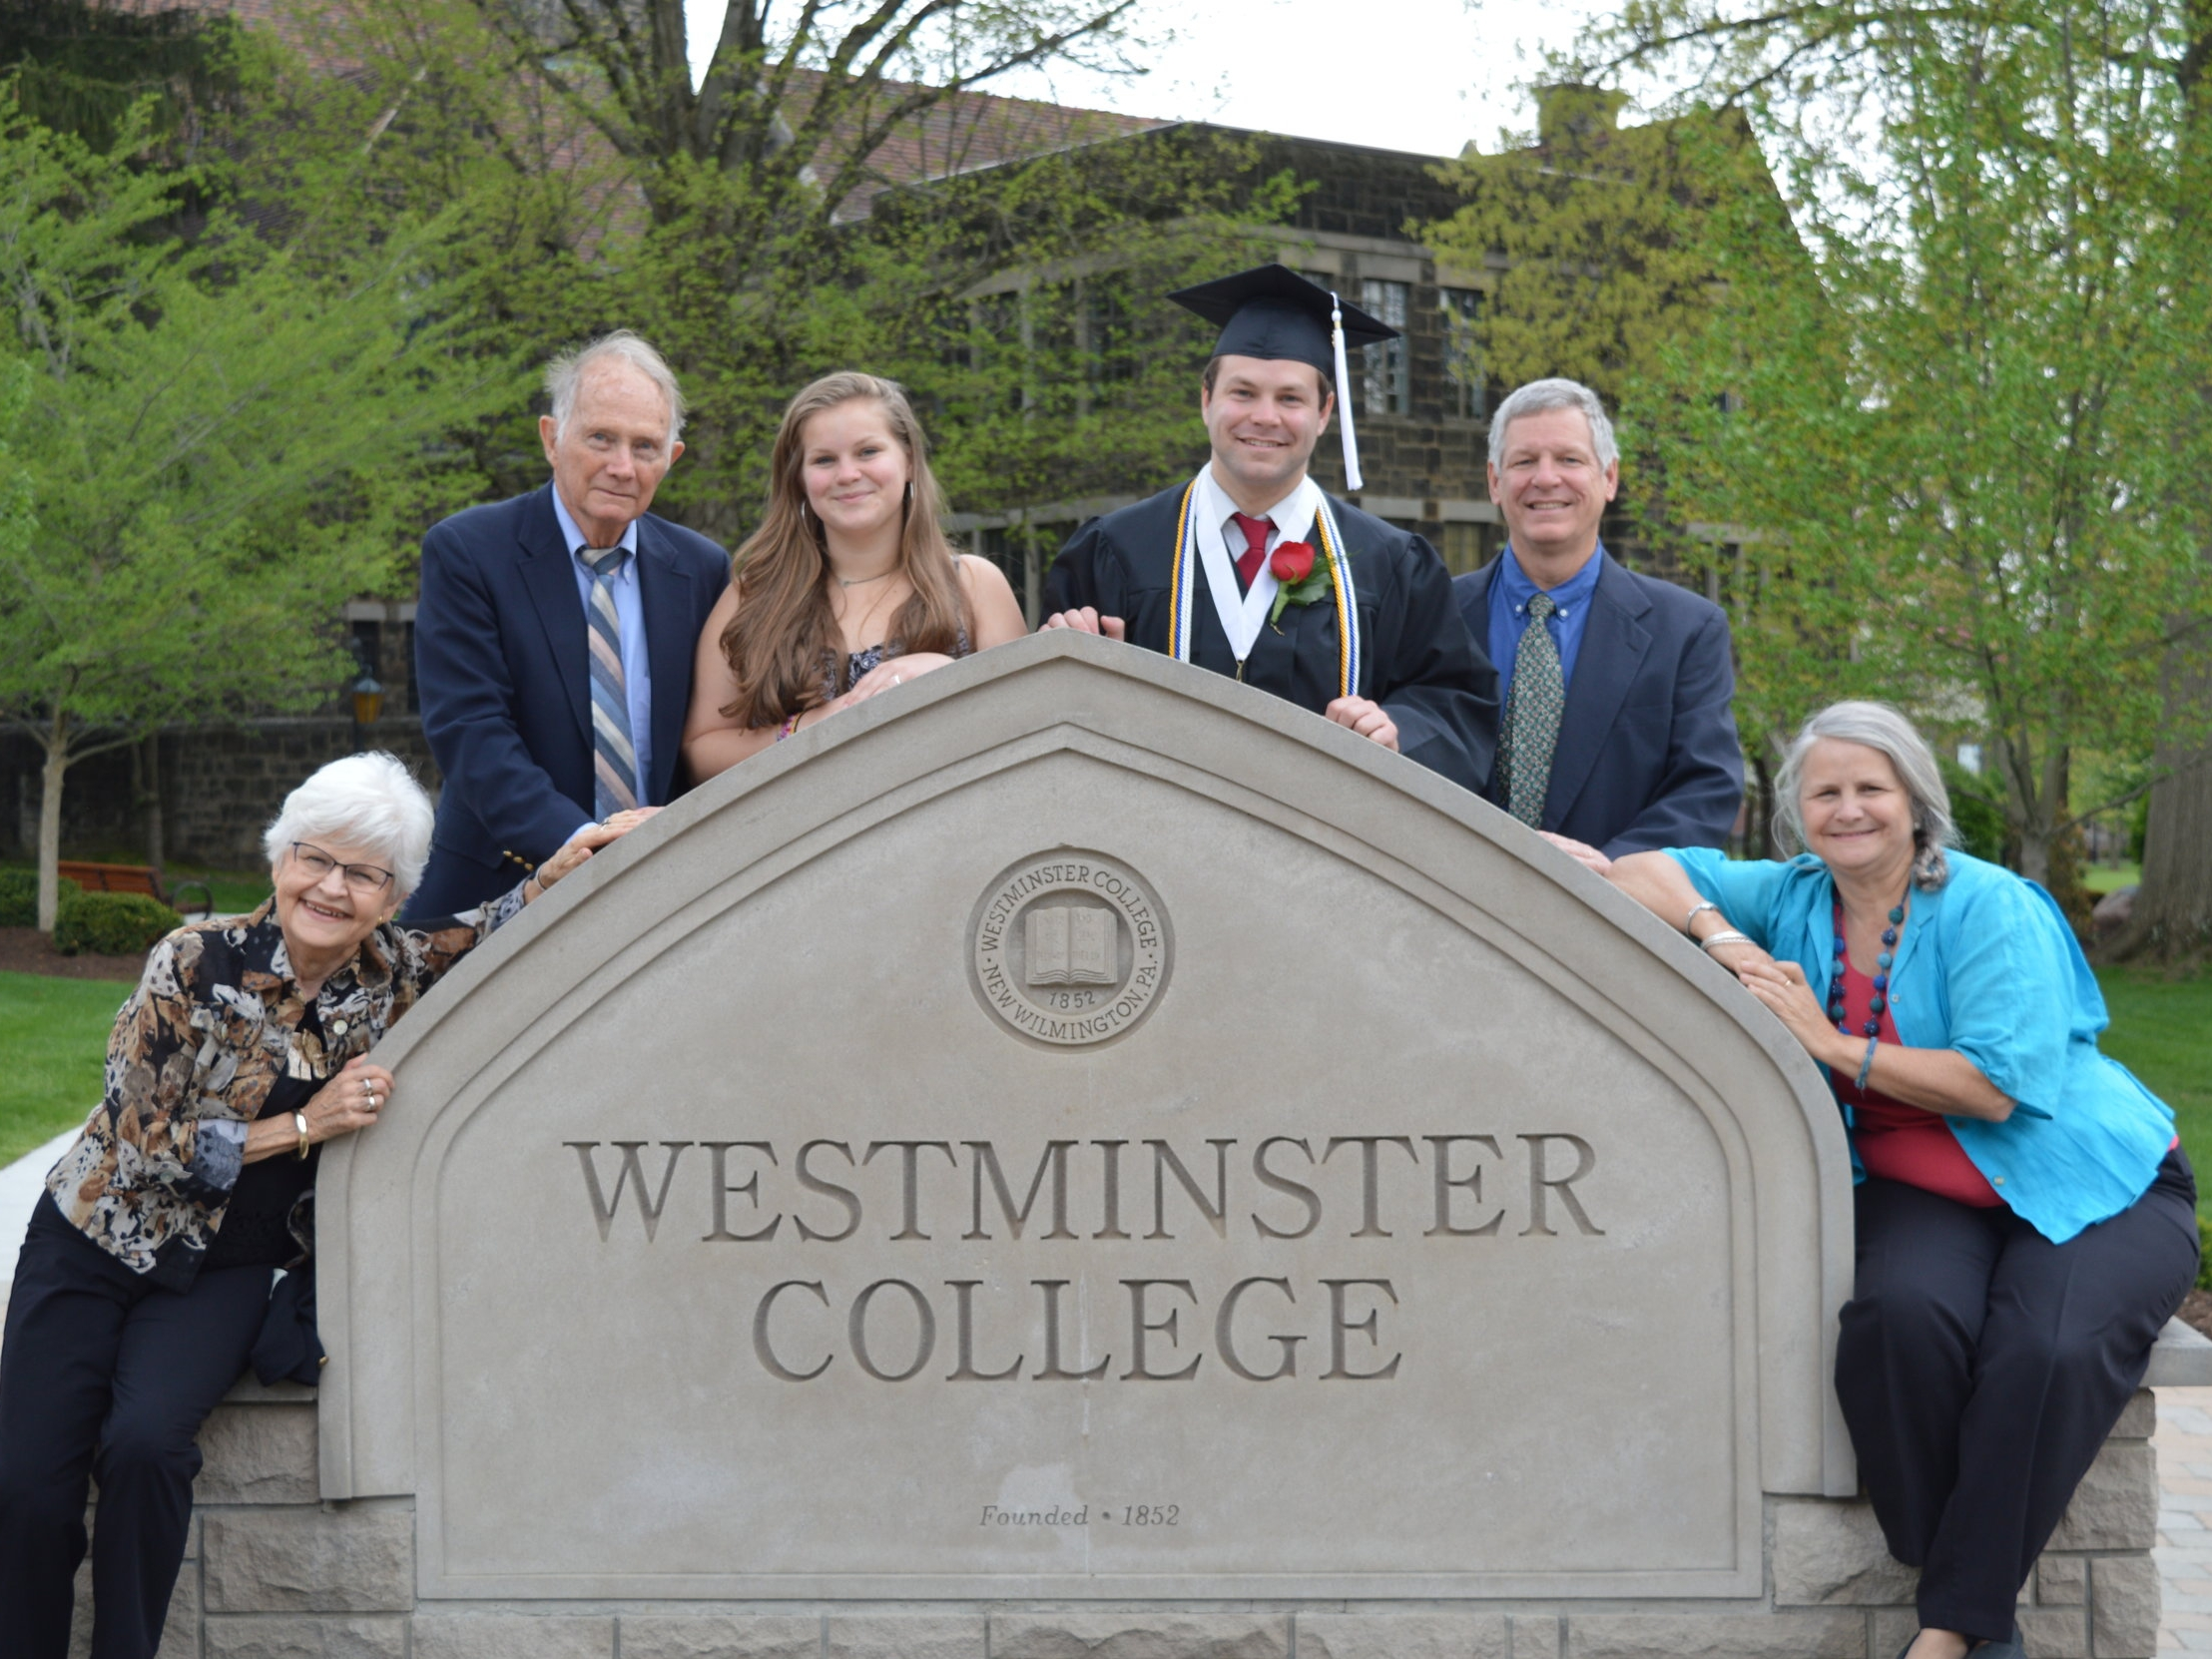 Attending Robert's college graduation with grandparents Bill and Nancy Warlick